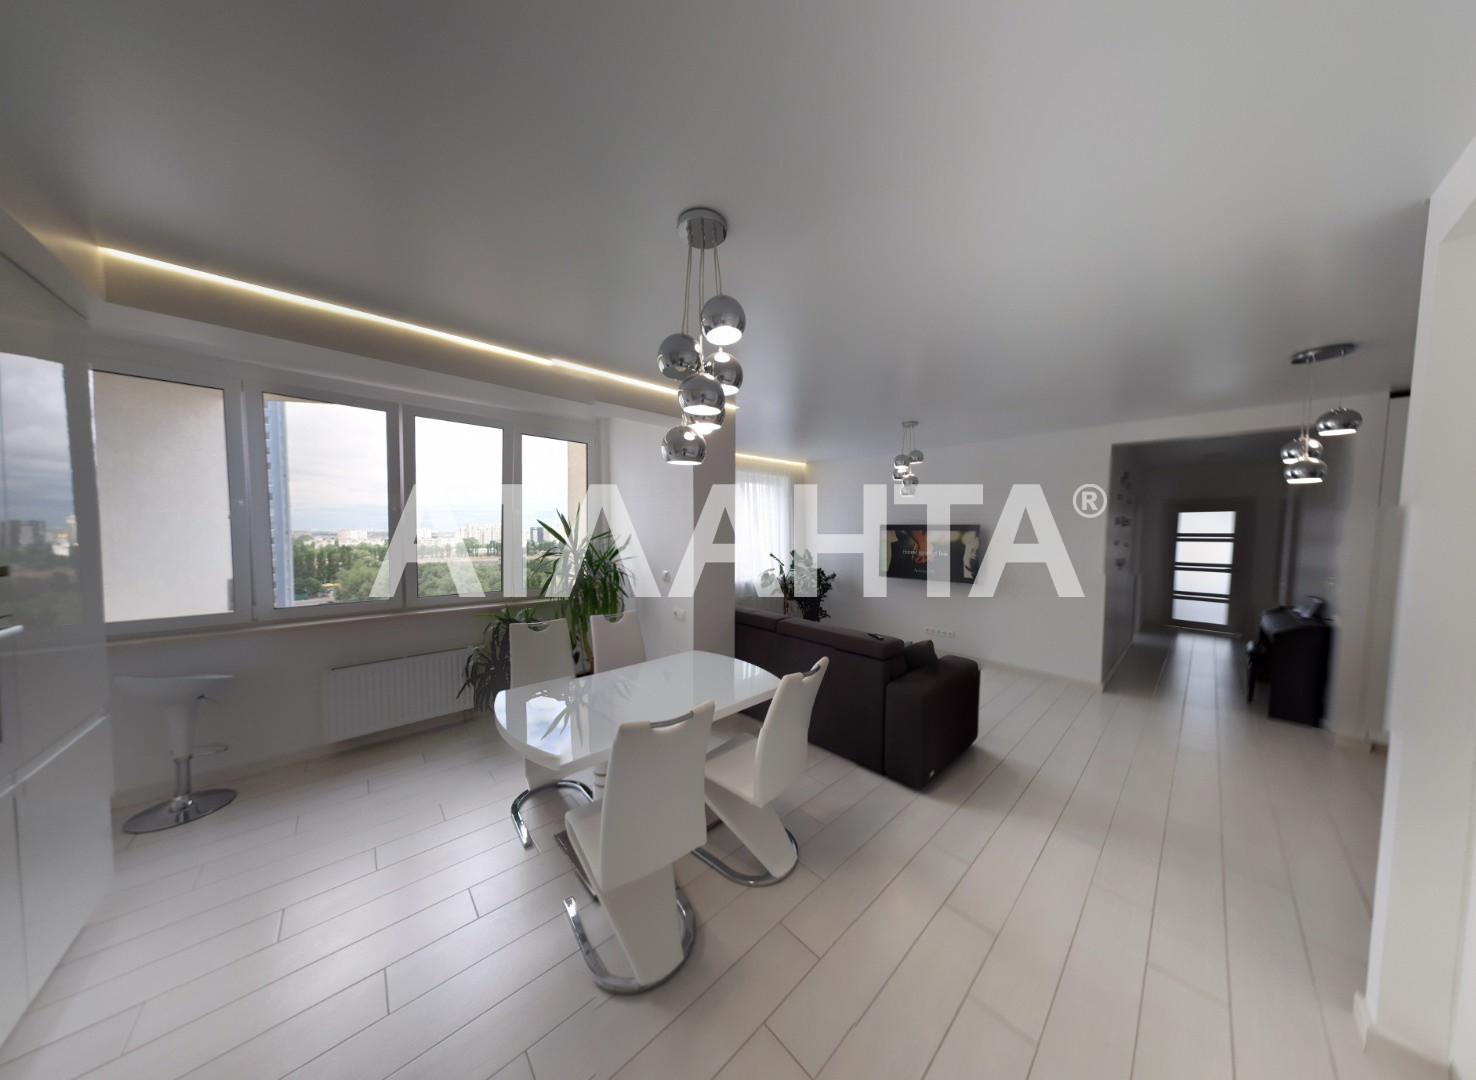 Продается 3-комнатная Квартира на ул. Просп. Глушкова — 160 000 у.е. (фото №4)